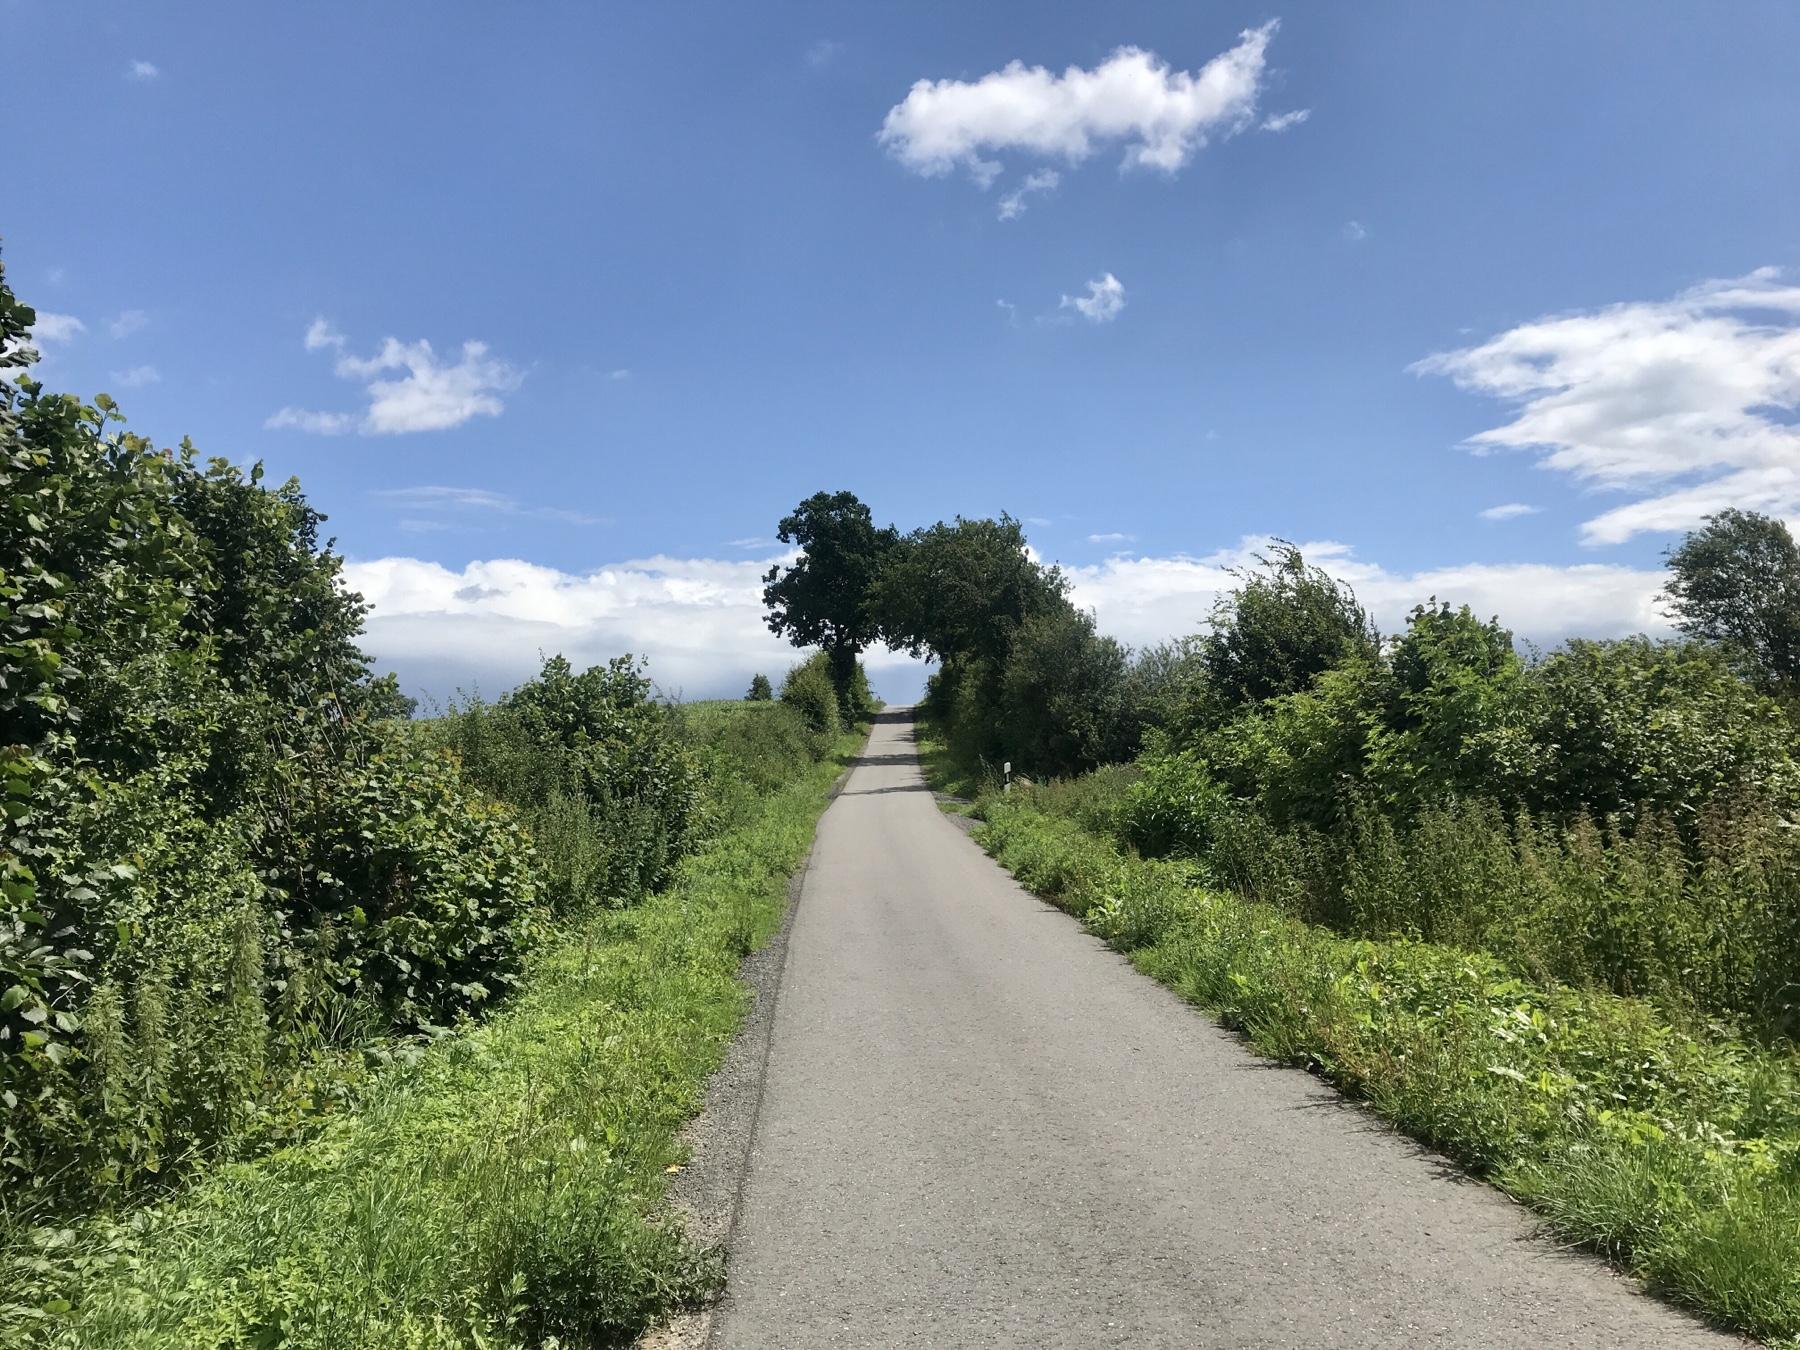 Auf dem Weg nach Lübeck, Stormarnweg Etappe 6